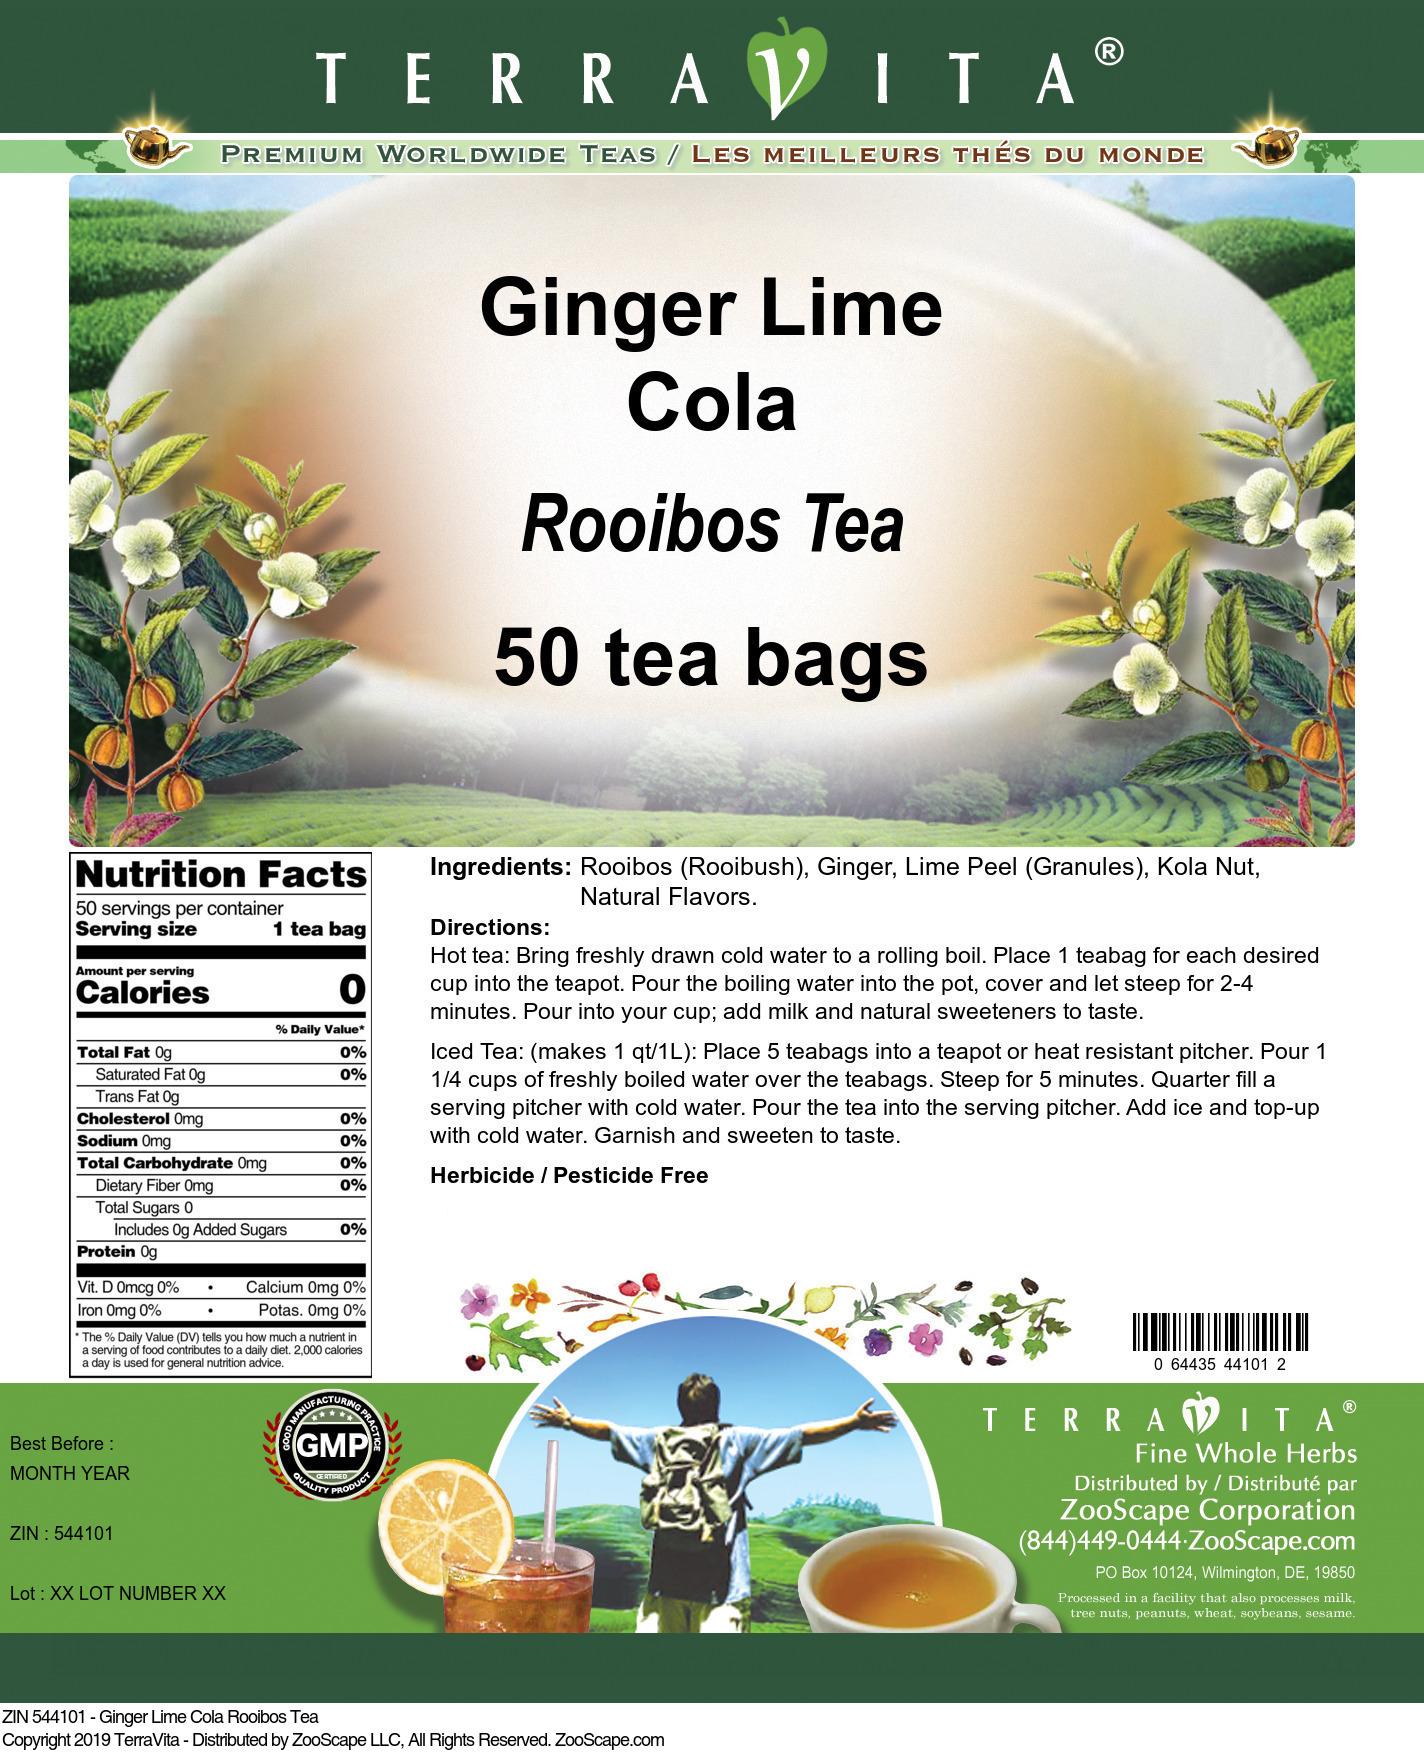 Ginger Lime Cola Rooibos Tea